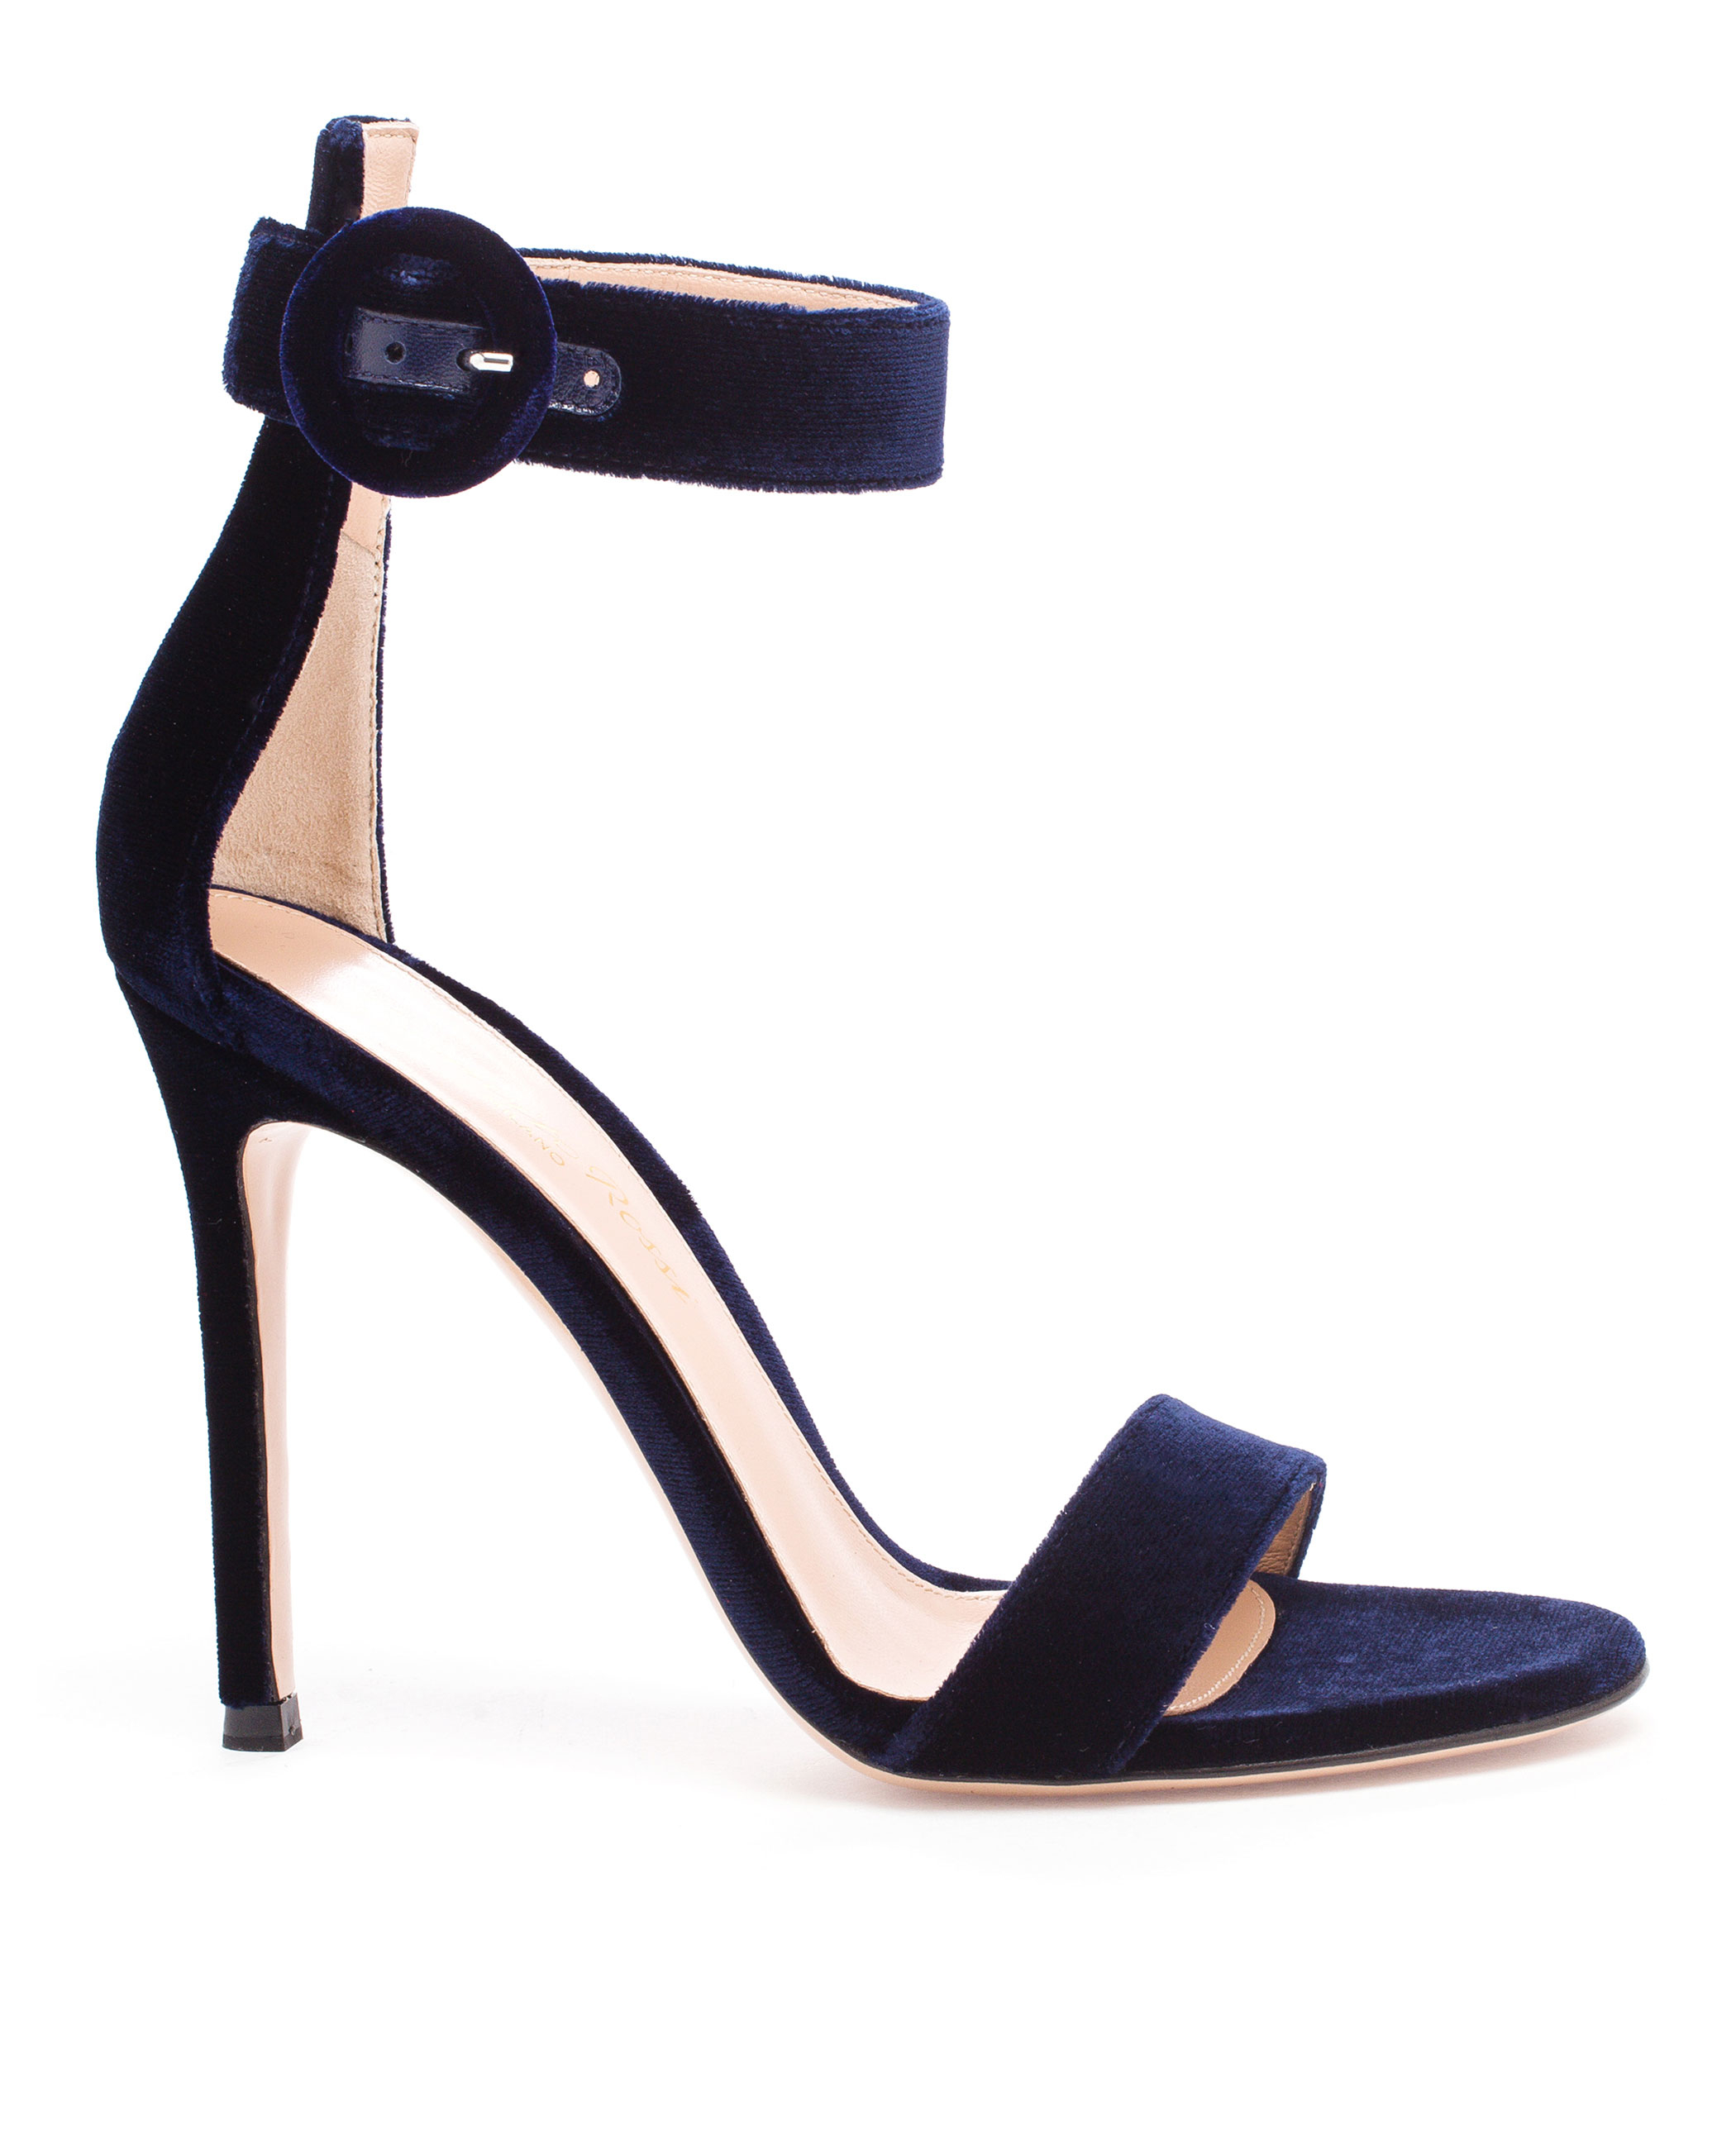 494f61982 Gianvito Rossi Portofino Velvet Sandals in Blue - Lyst